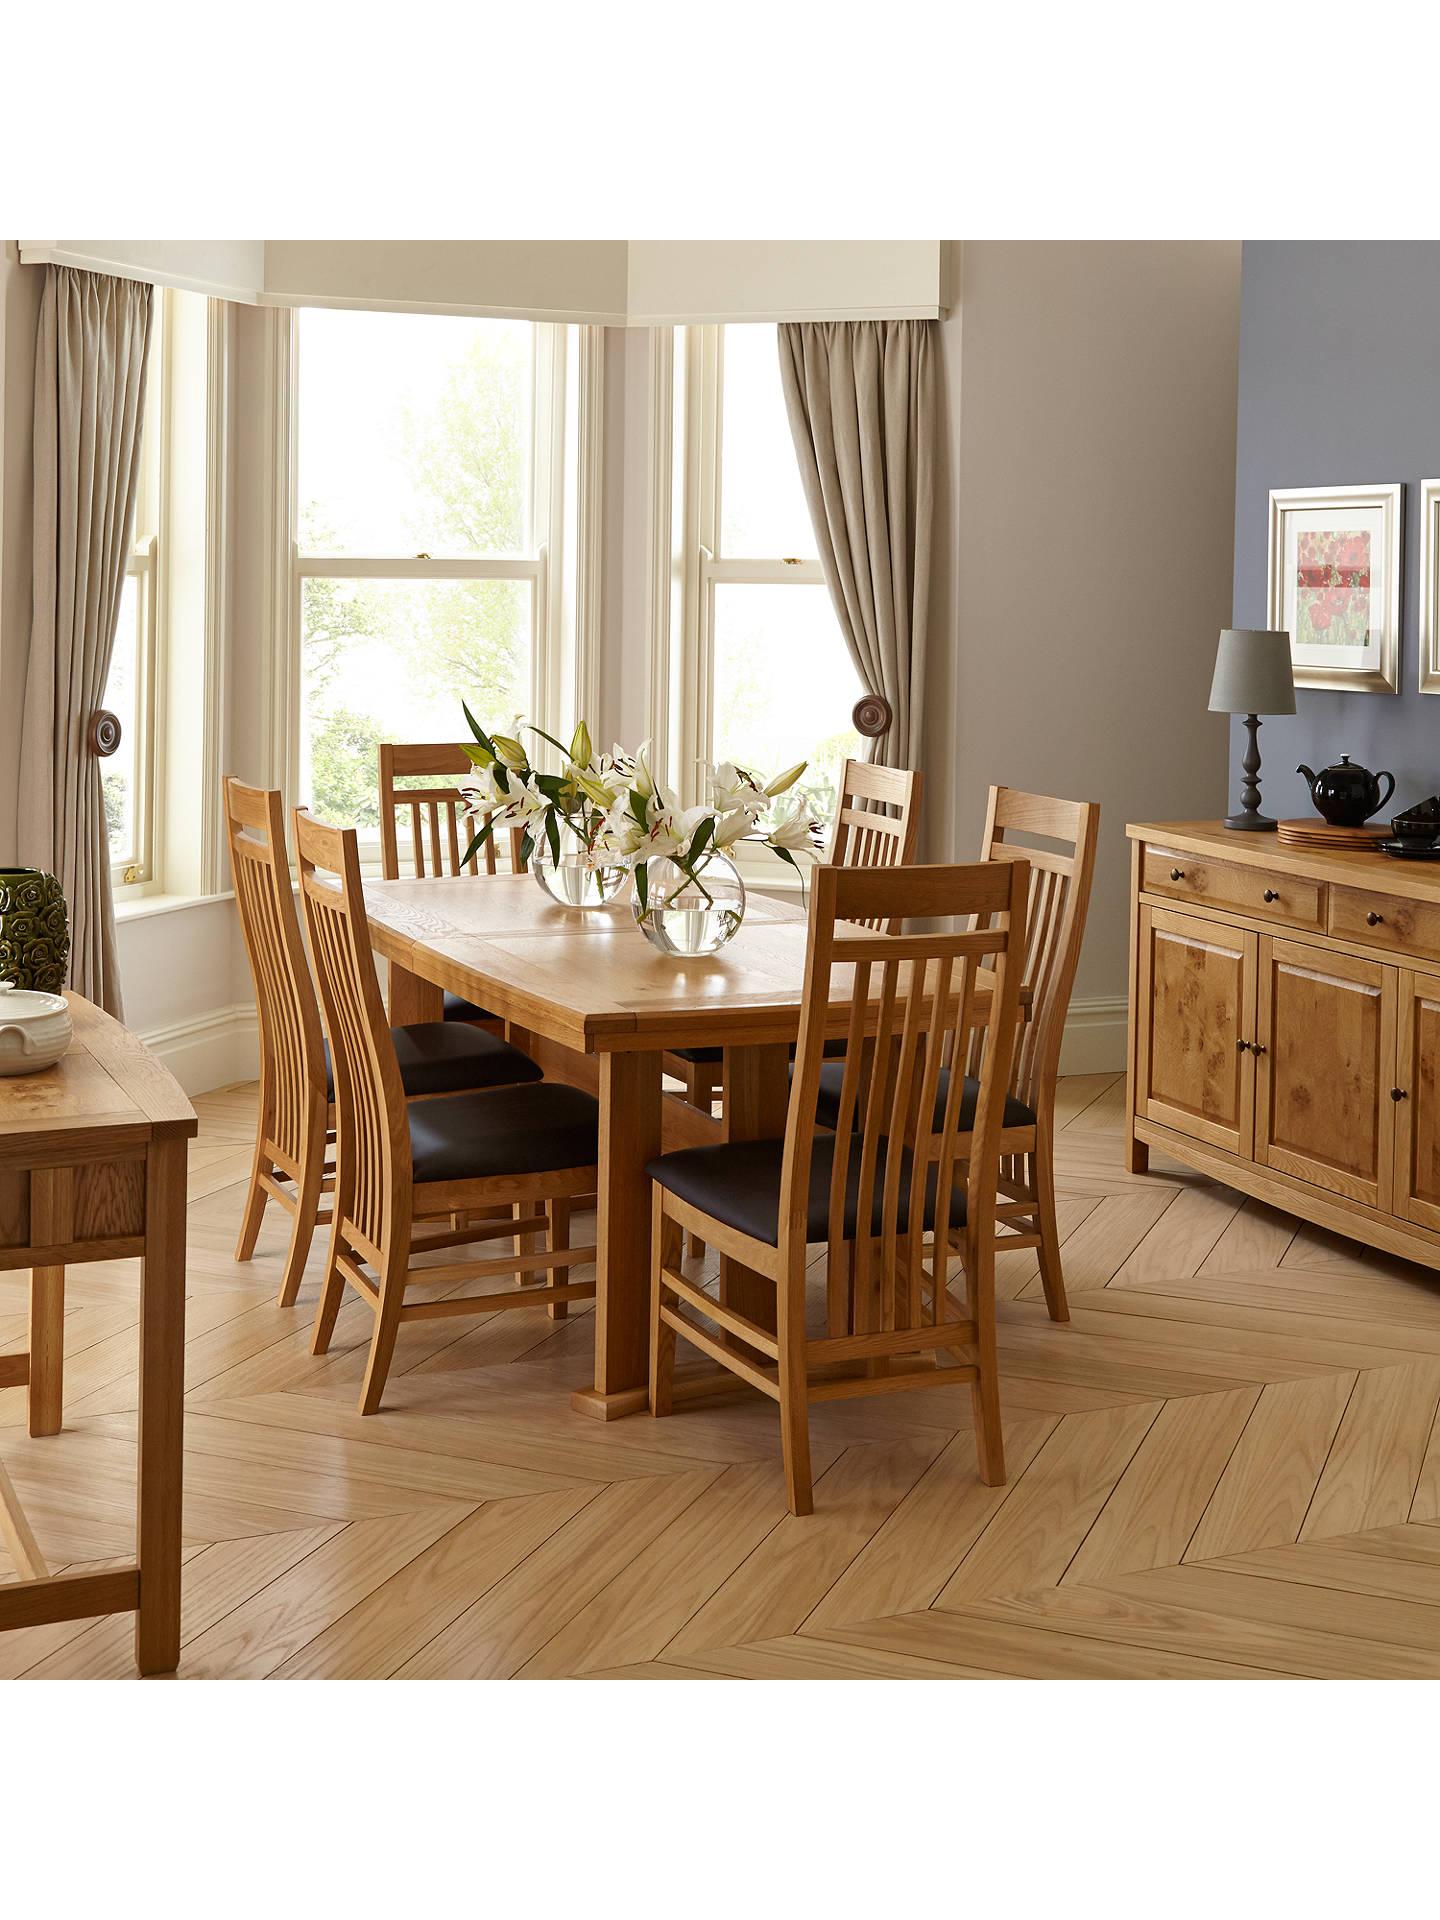 Buyjohn lewis burford extending 6 8 seater dining table online at johnlewis com